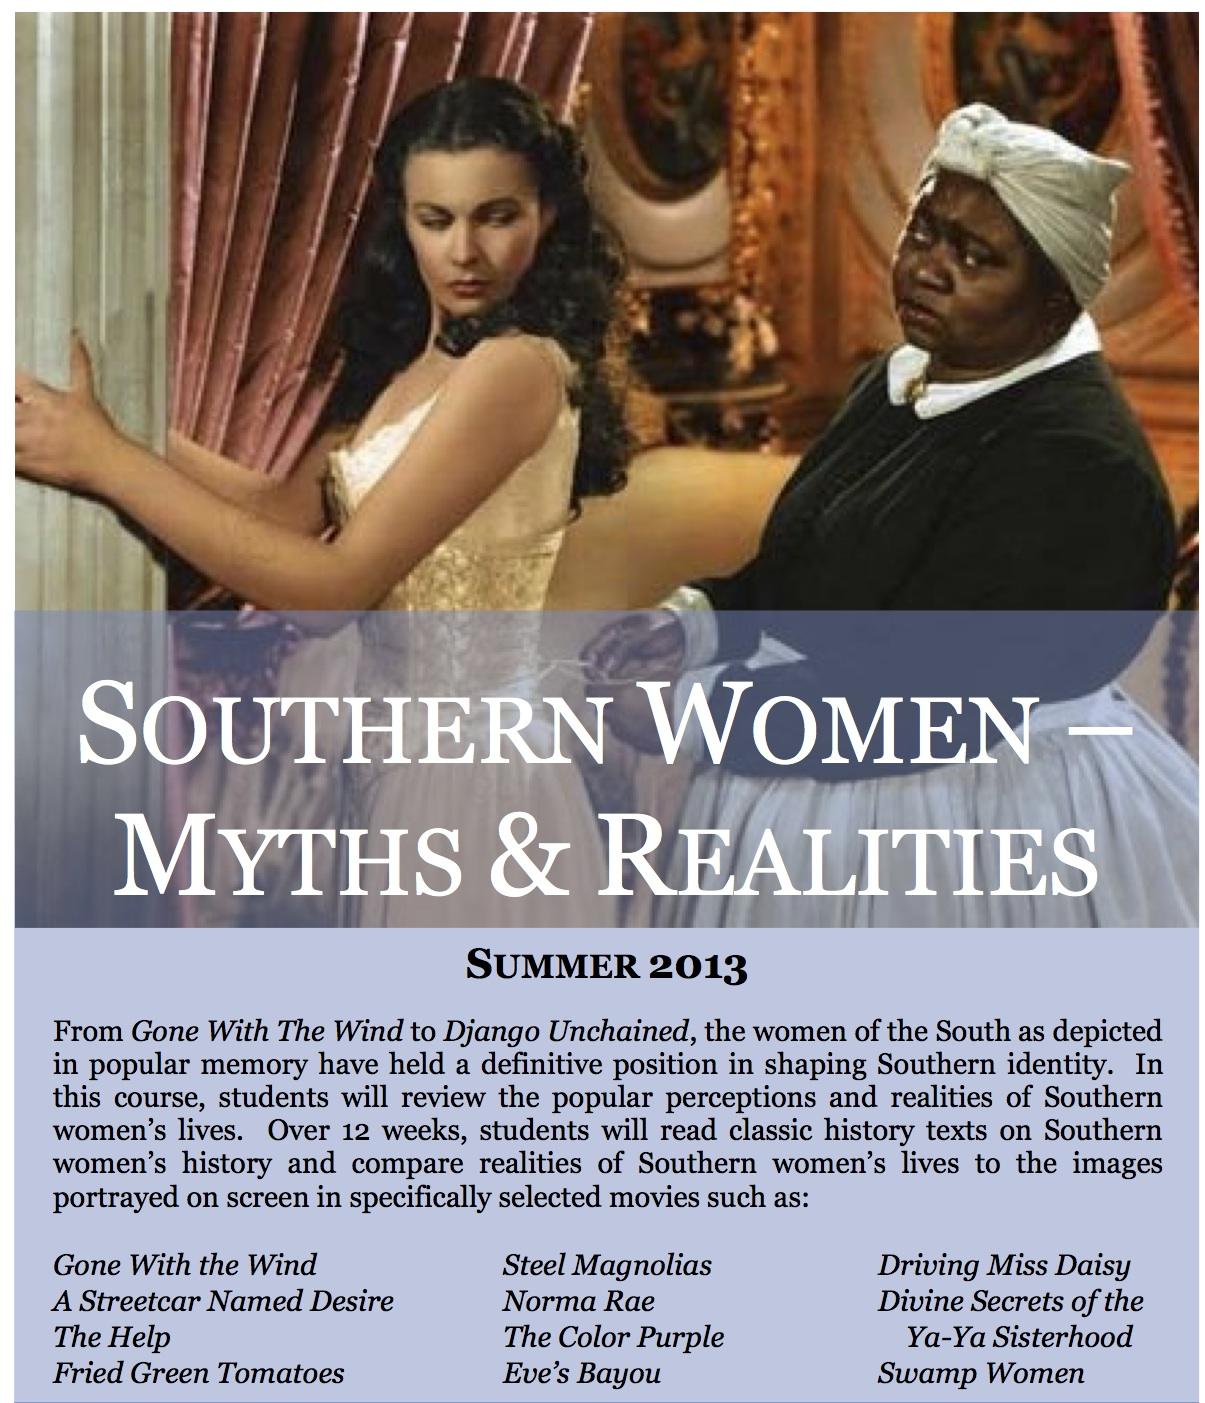 Southern Women -- Flyer Image.jpg